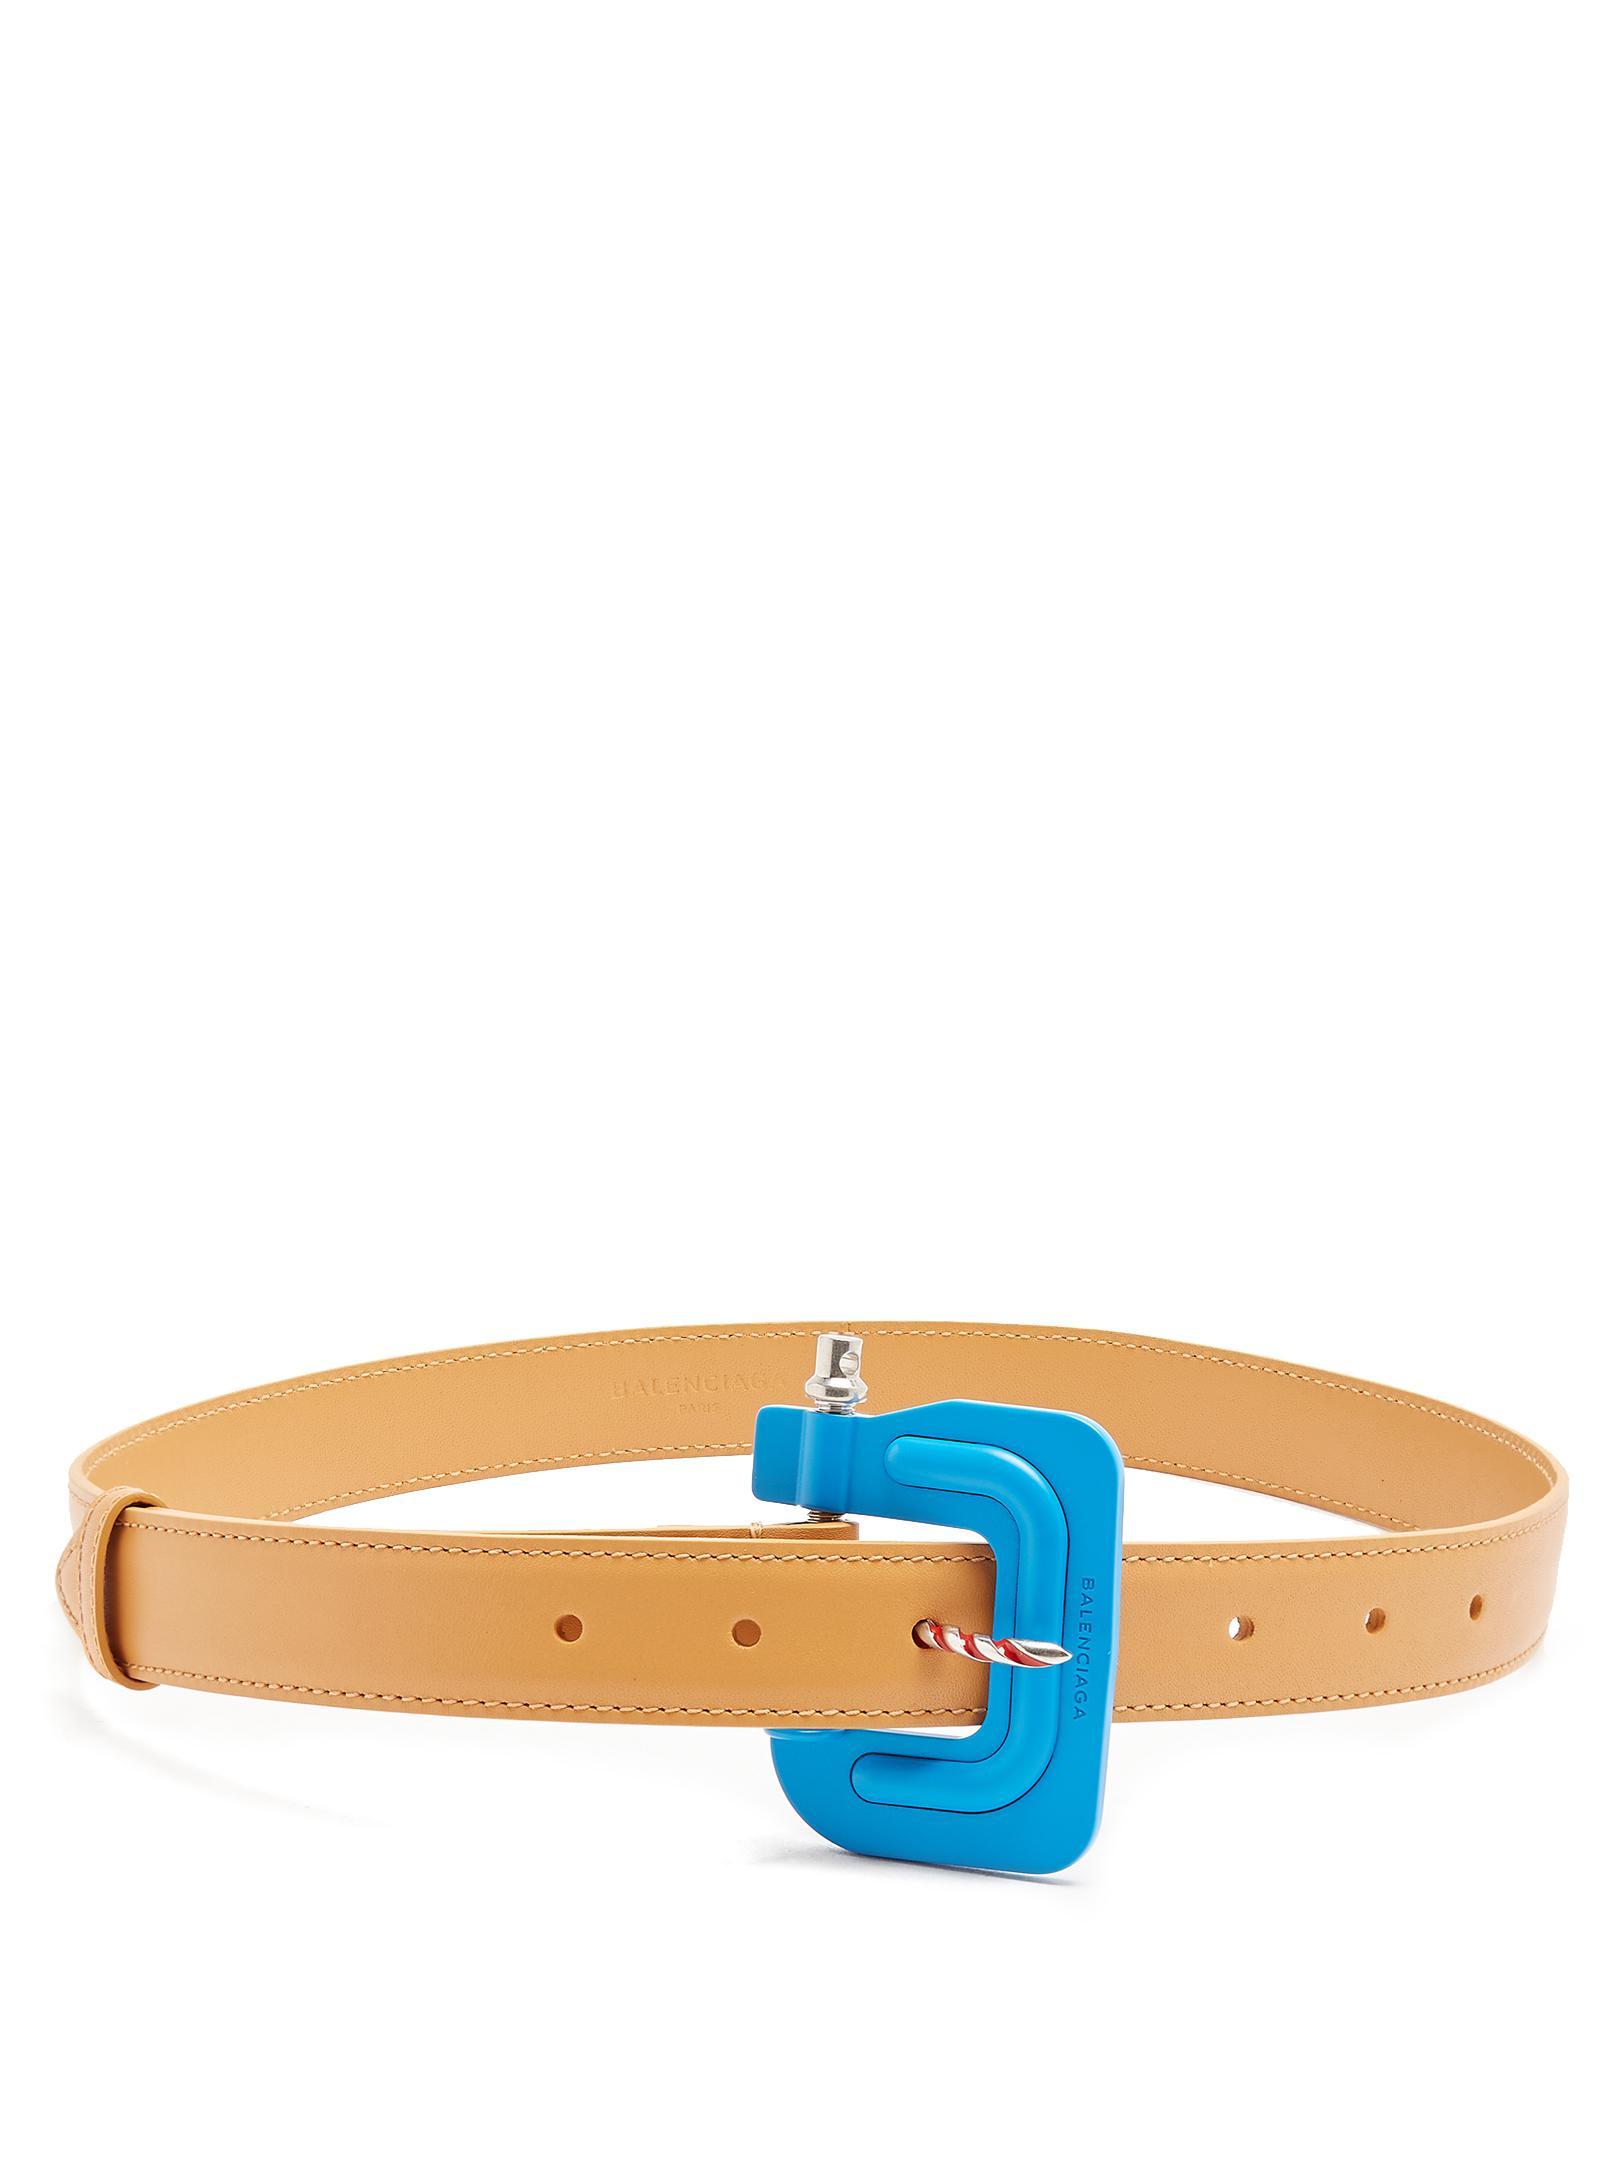 Clamp-buckle leather belt Balenciaga SSx1j73XR